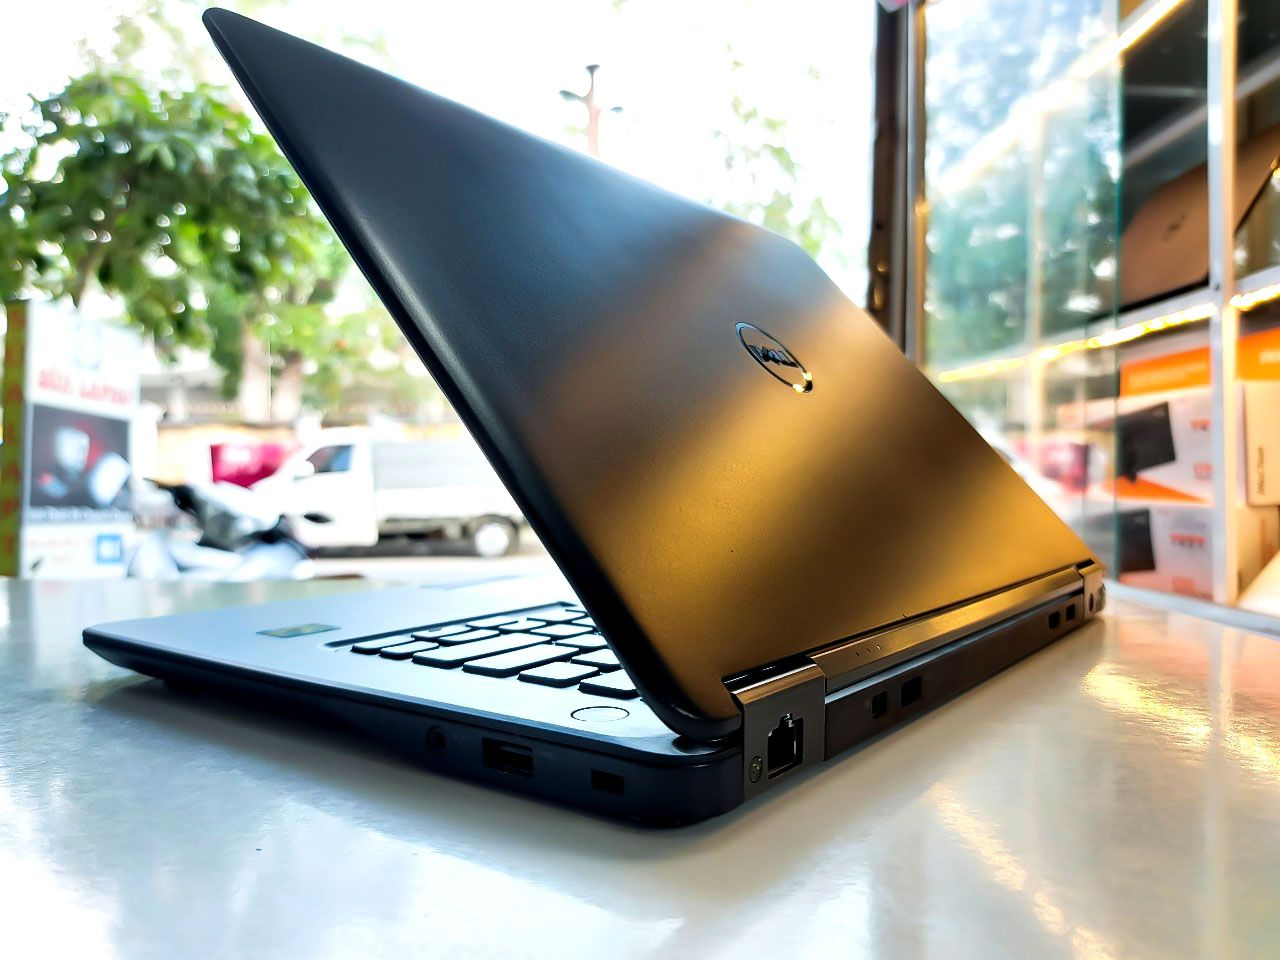 Dell Latitude E7450 - Hoàng Tín Laptop